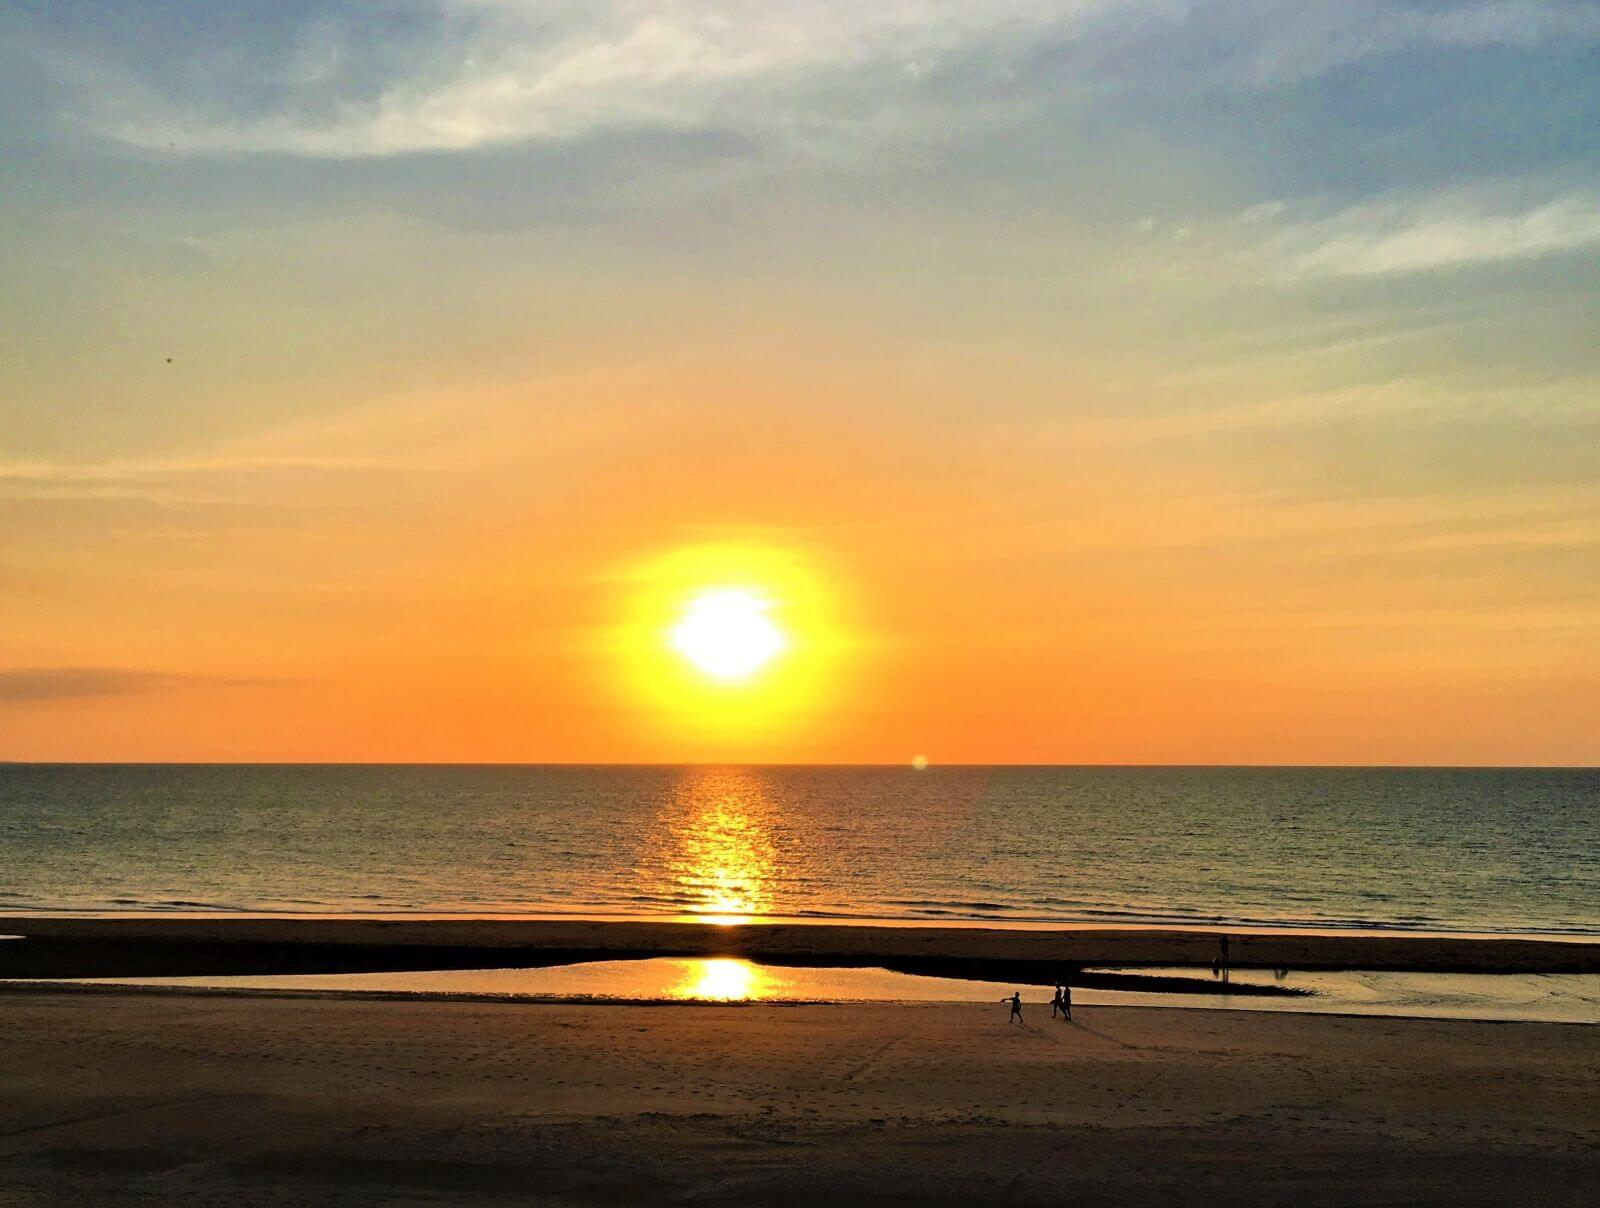 Sonnenuntergang über dem Meer in Australien